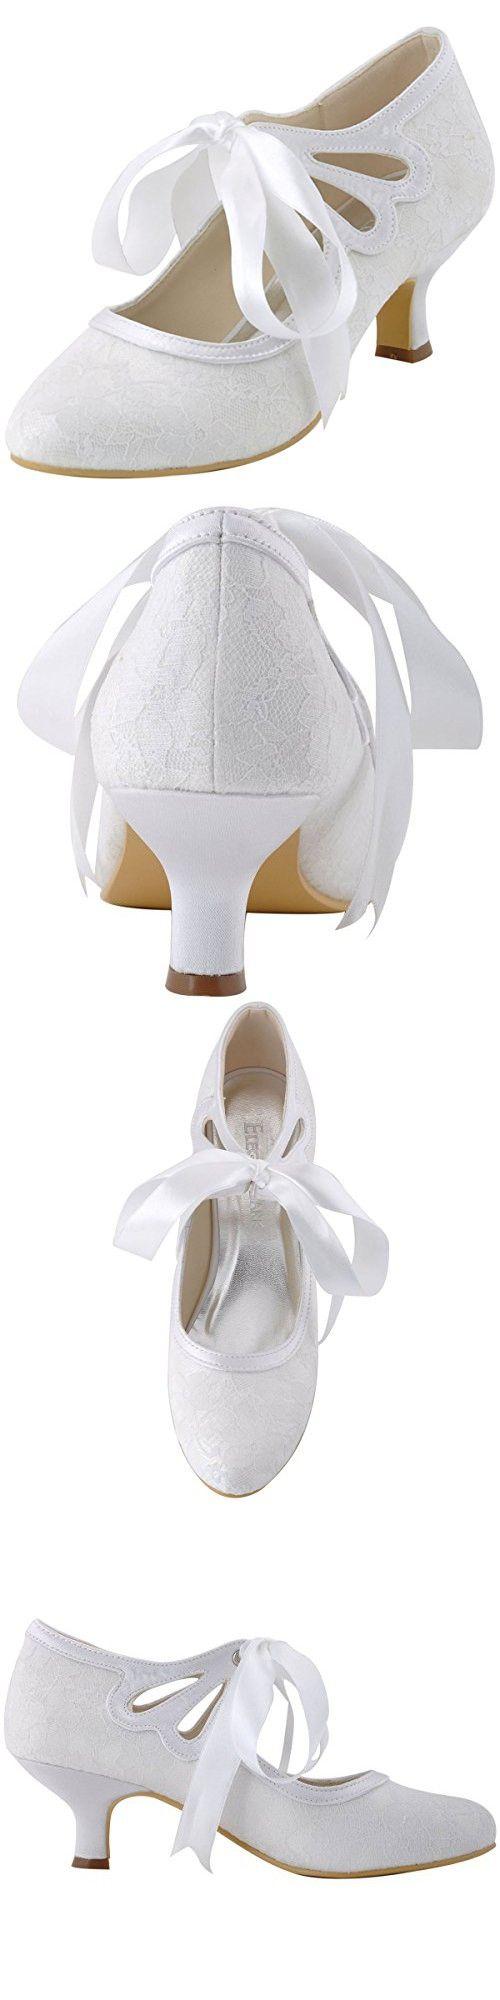 Low heel dress shoes for wedding  ElegantPark HC Womenus Mary Jane Cut Out Closed Toe Low Heel